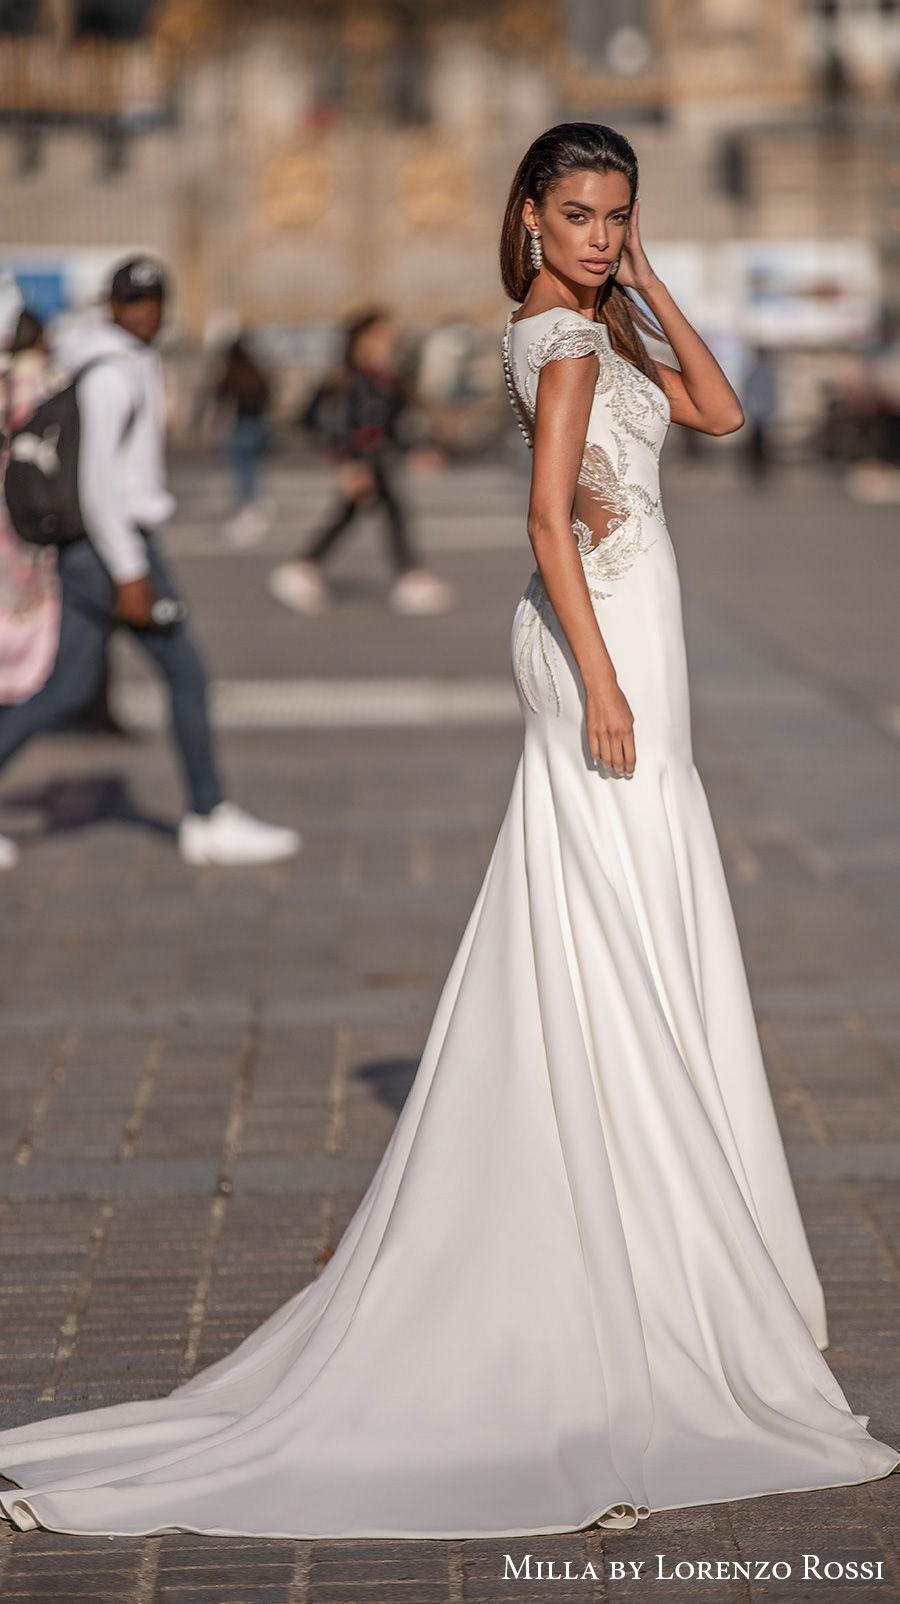 milla lorenzo rossi 2021 bridal cap sleeves bateau neckline simple glamorous elegant fit and flare mermaid wedding dress chapel train (bernadette) sdv